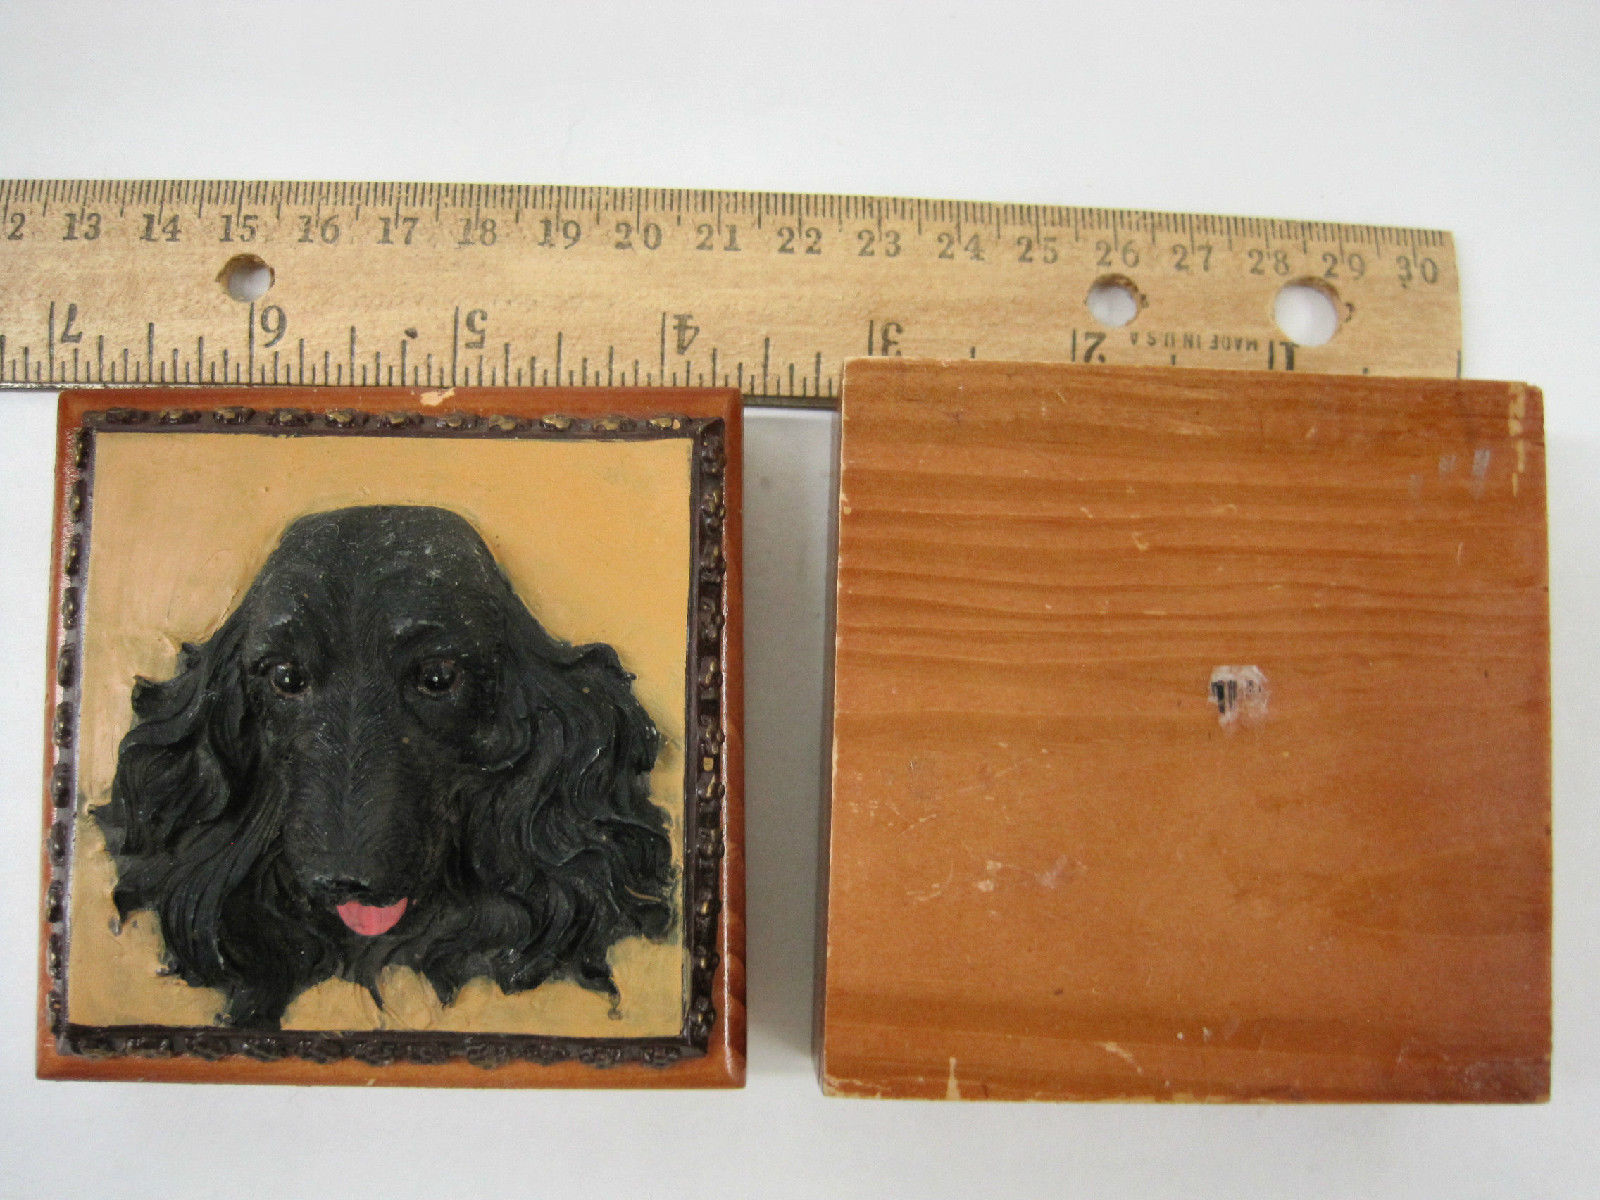 English Cocker Spaniel Black Dog Puppy Wooden Trinket Box Vintage 3 ins image 5